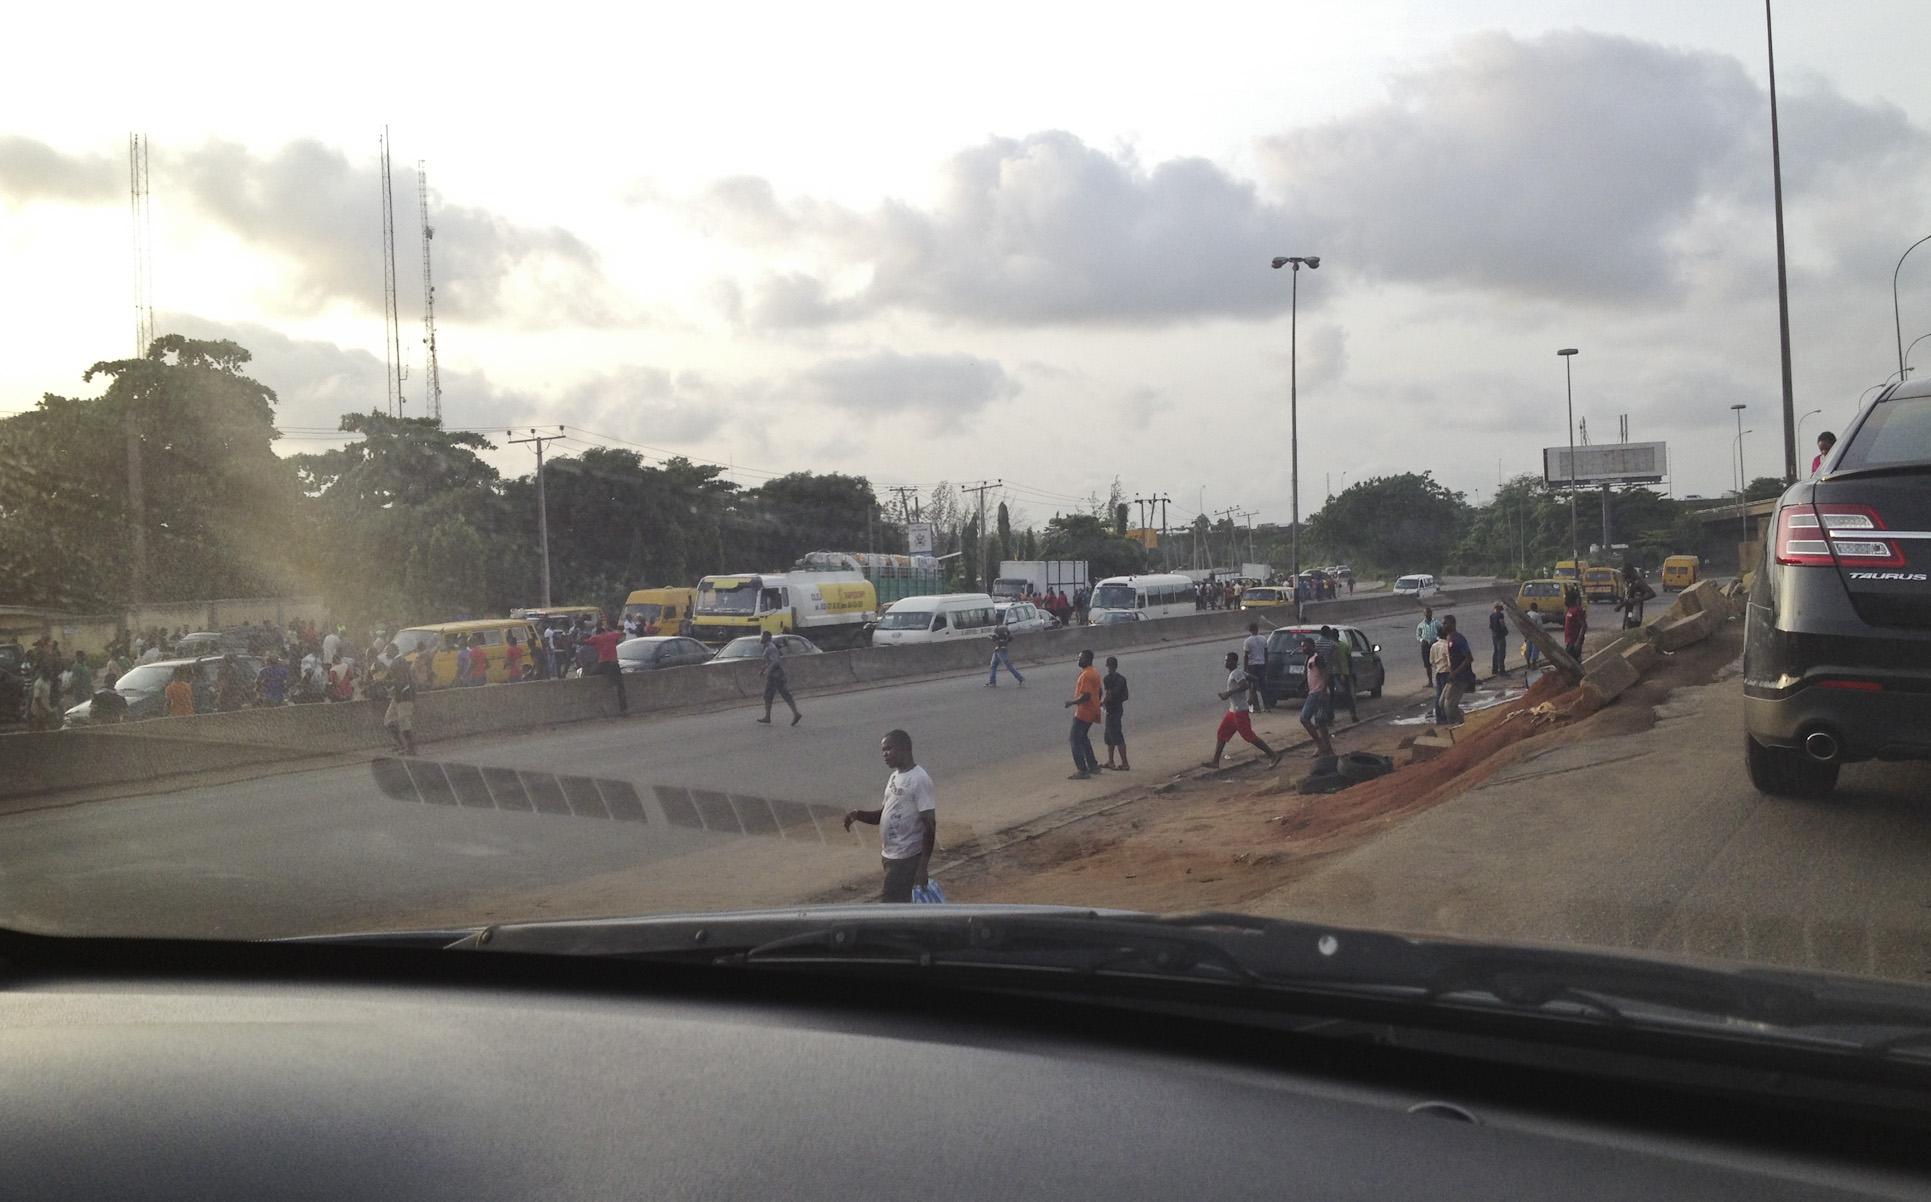 NigeriaTrip2014_02